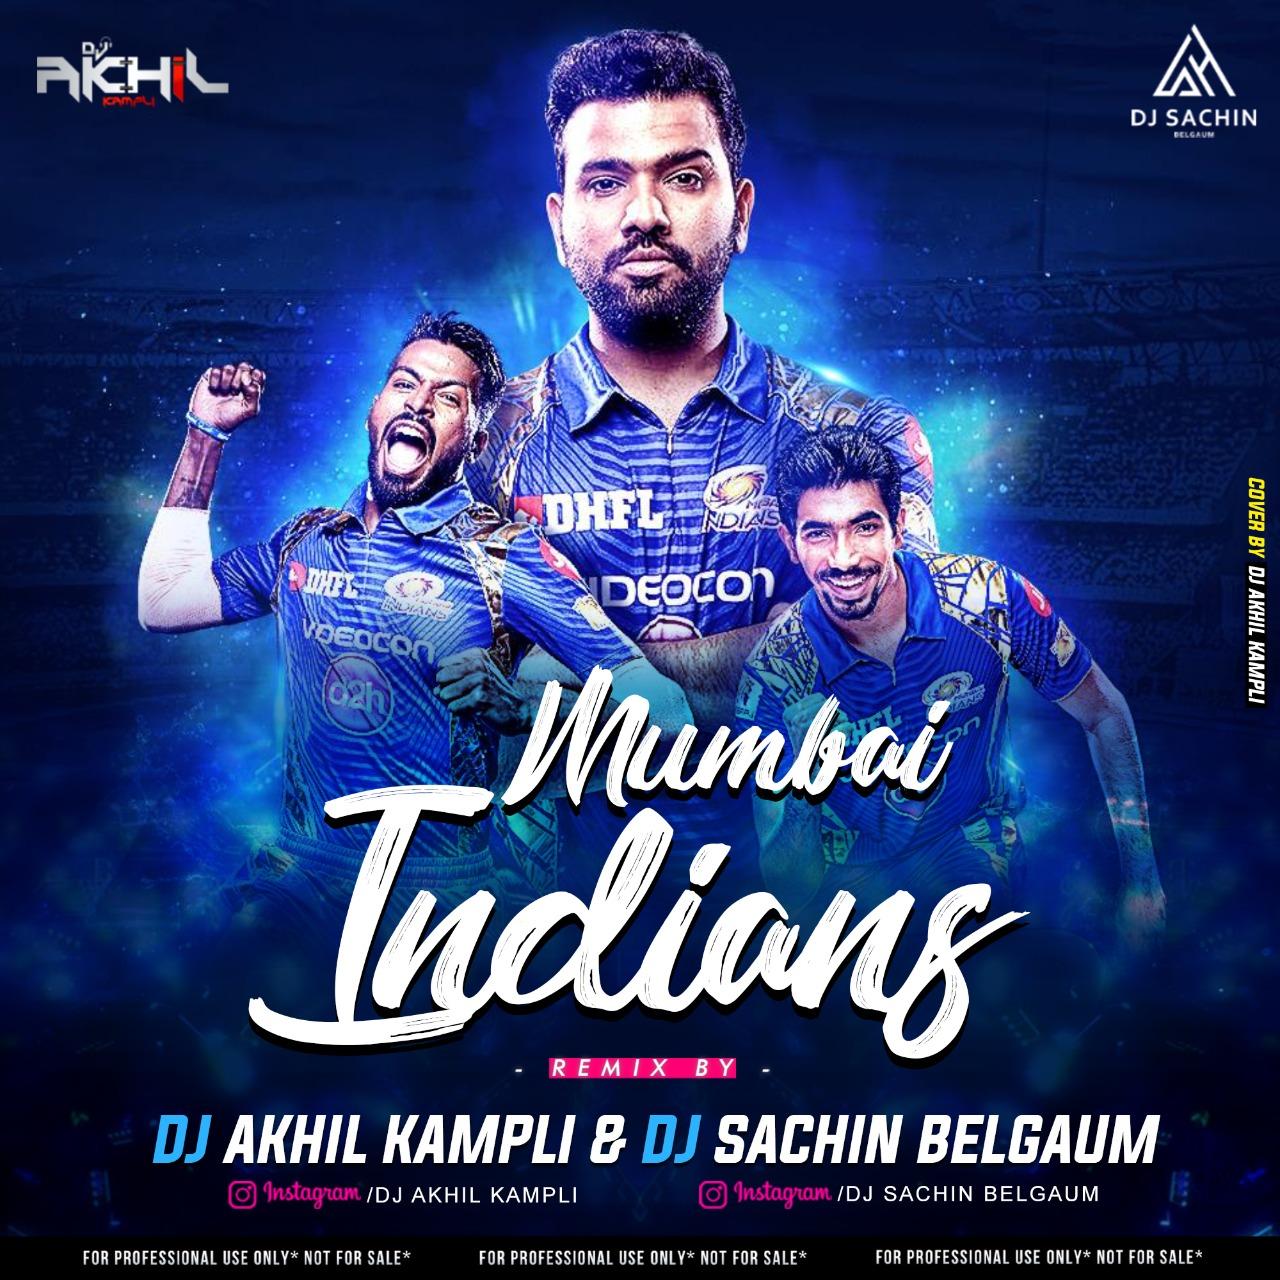 Mumbai Indians 2021 Dj Sachin Belgaum Dj Akhil Kampli